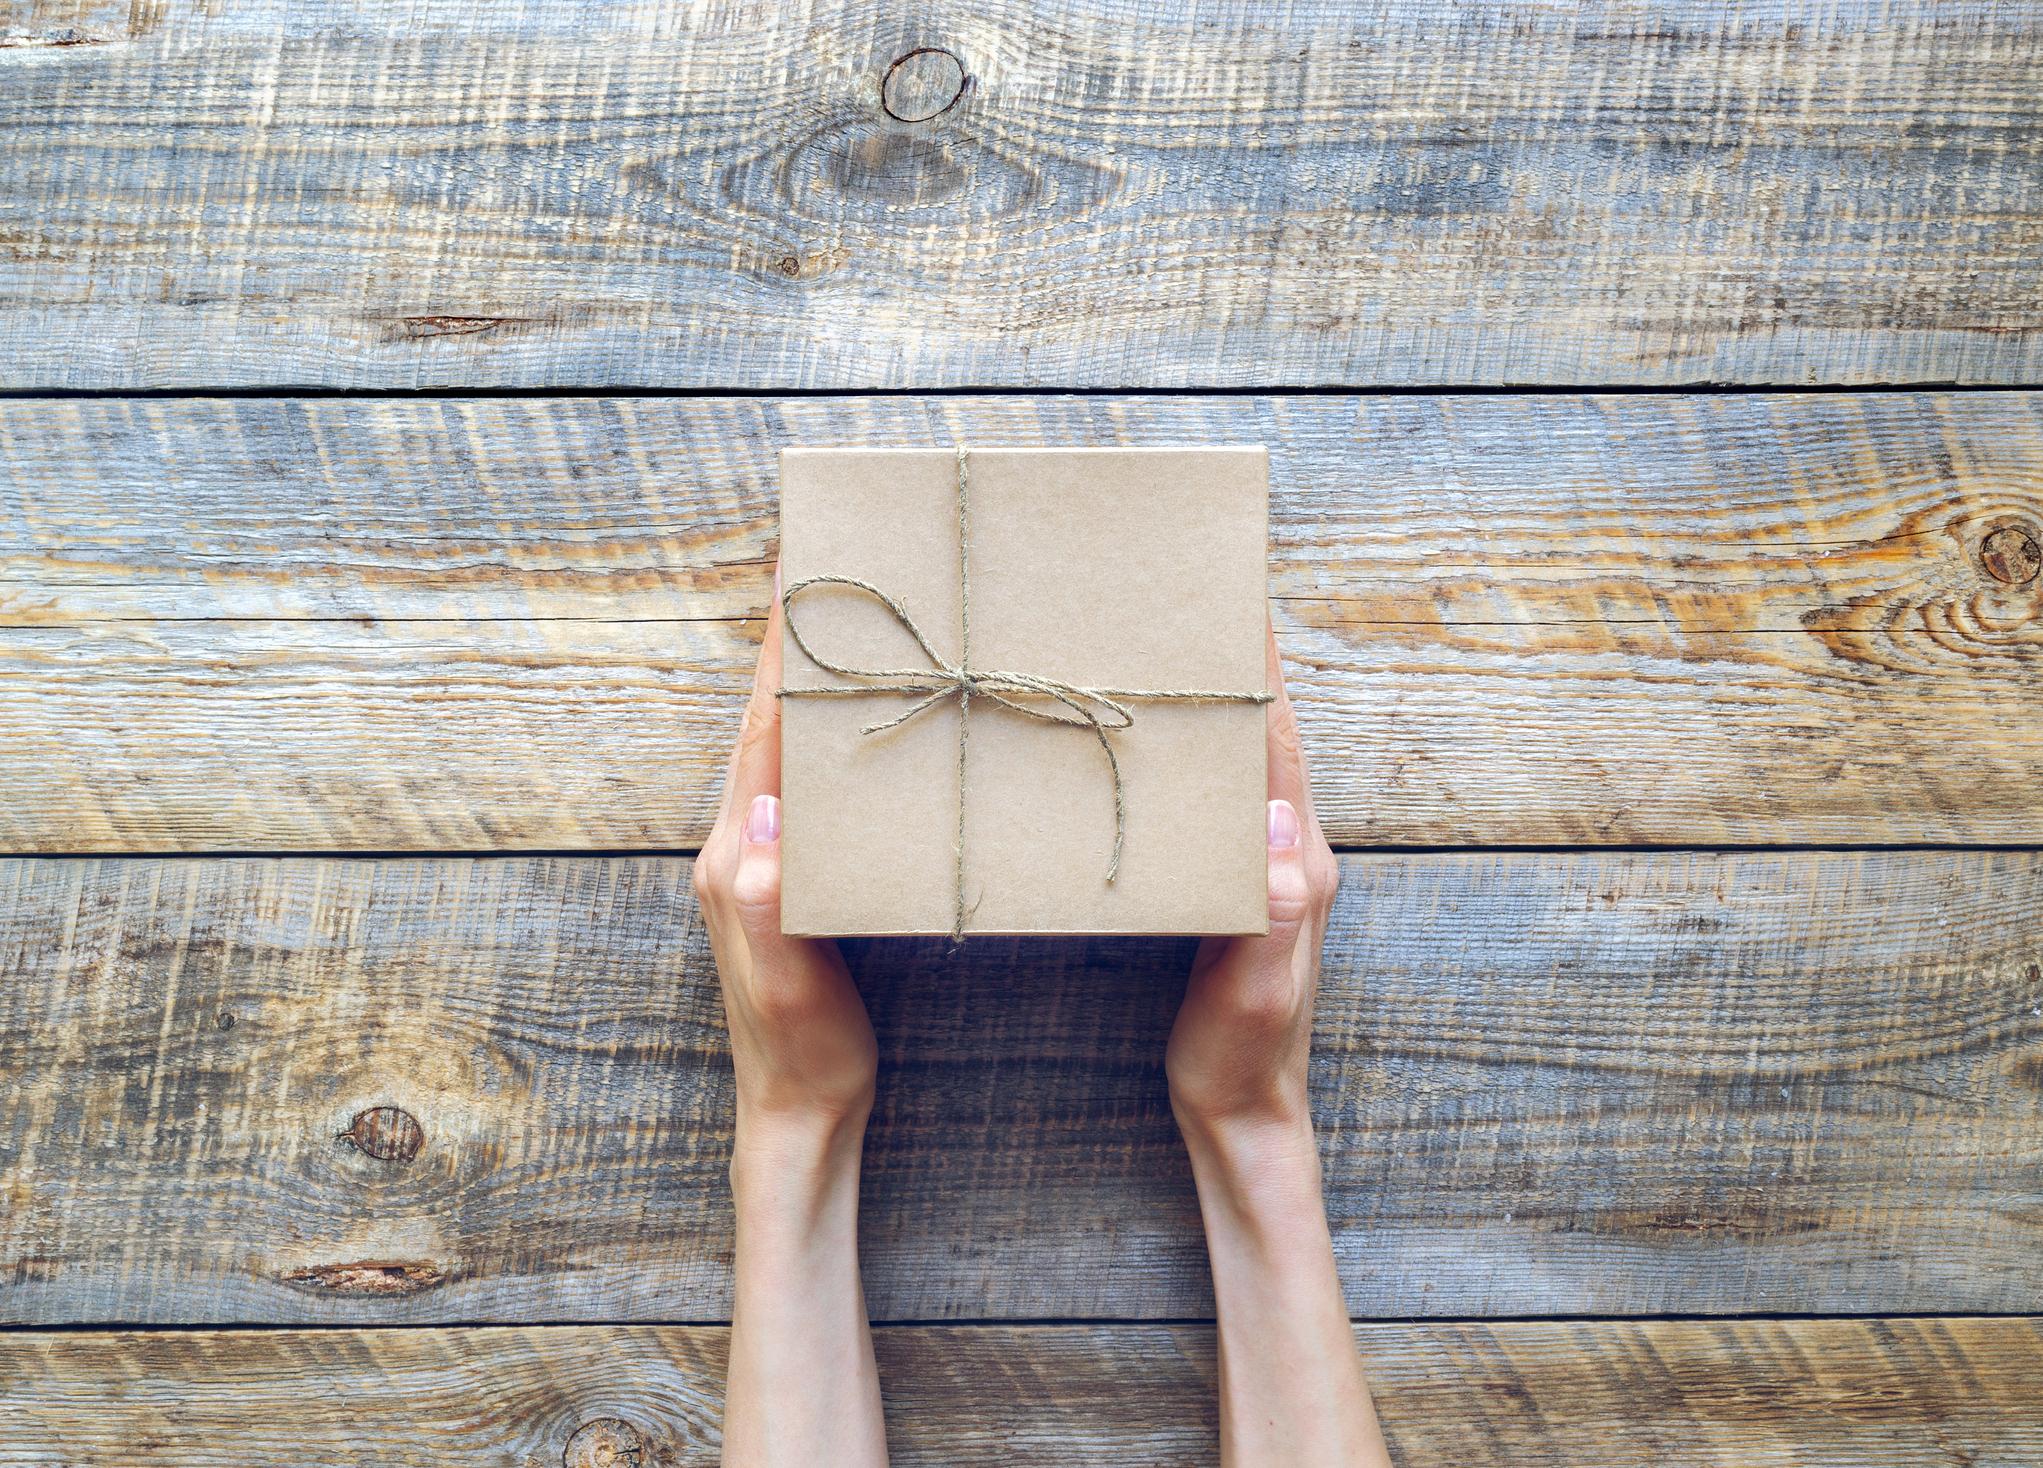 Shipping photo